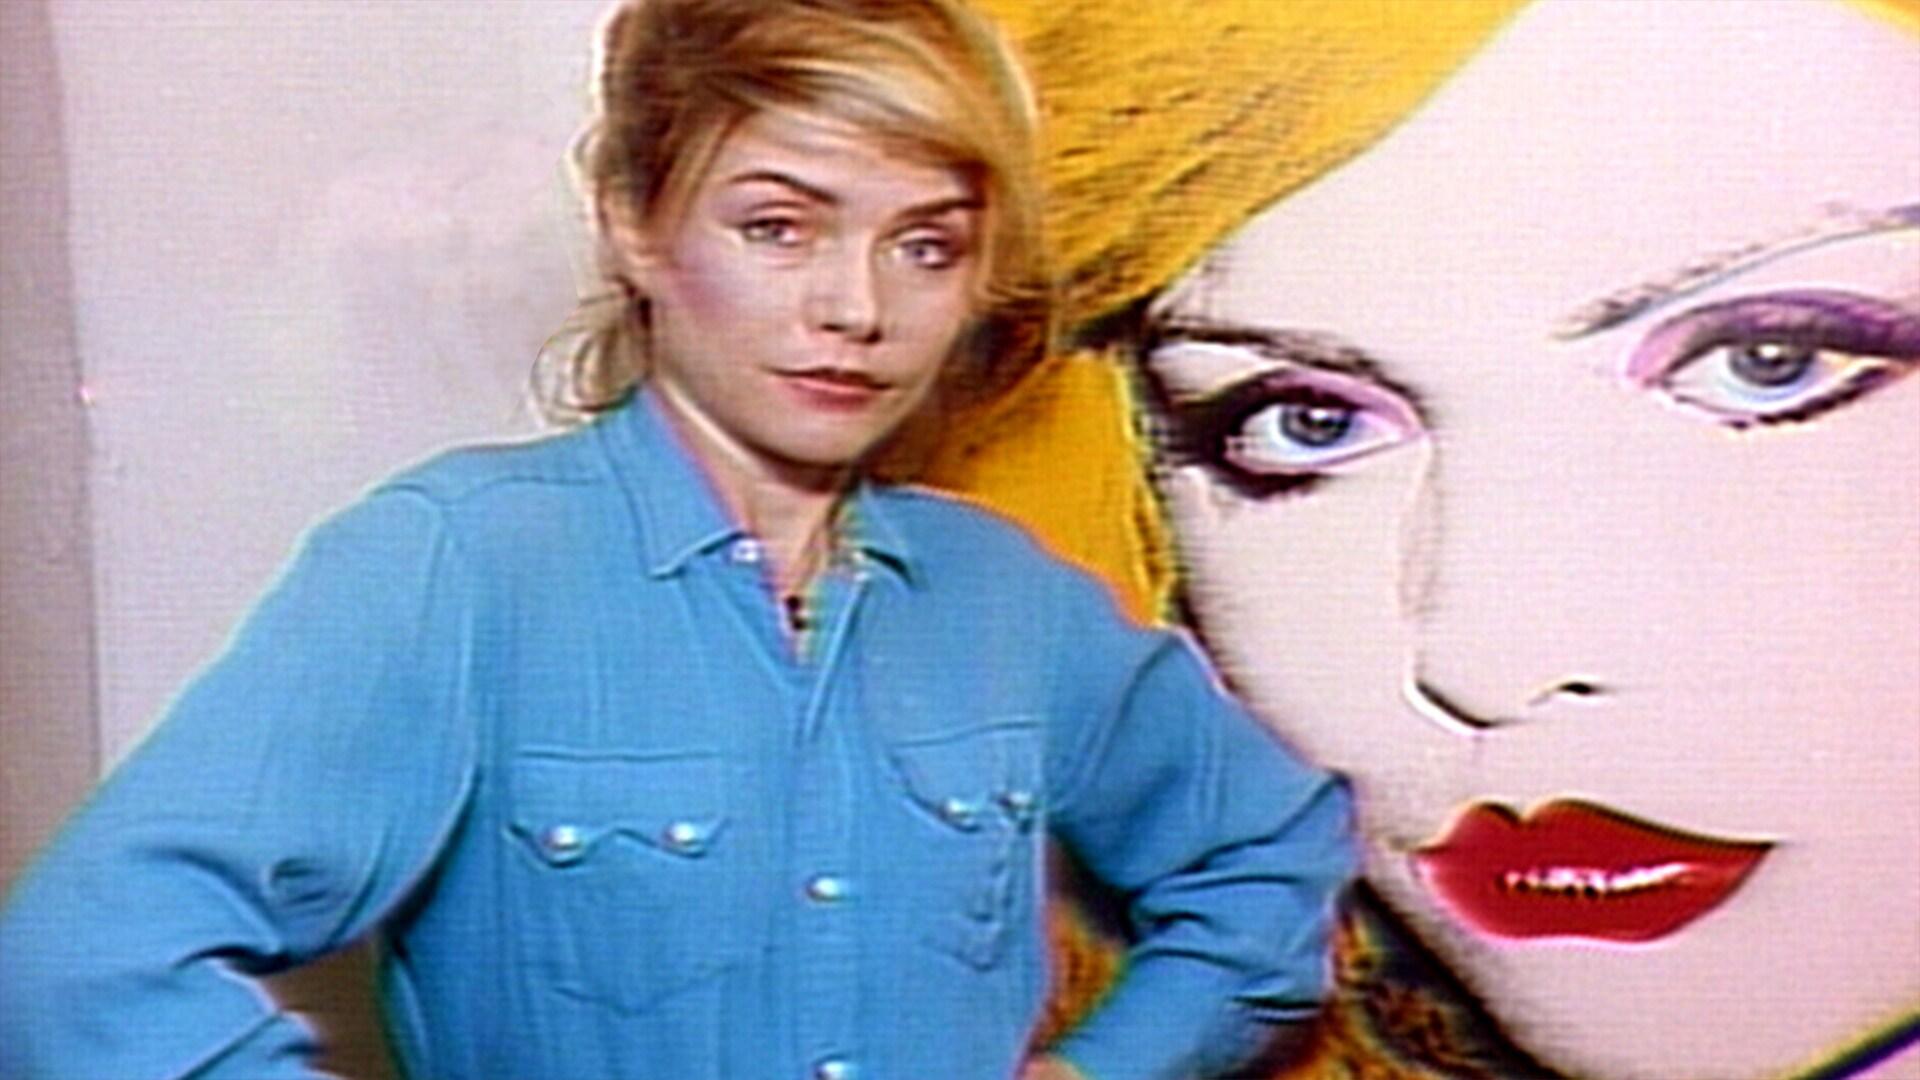 Debbie Harry: February 14, 1981